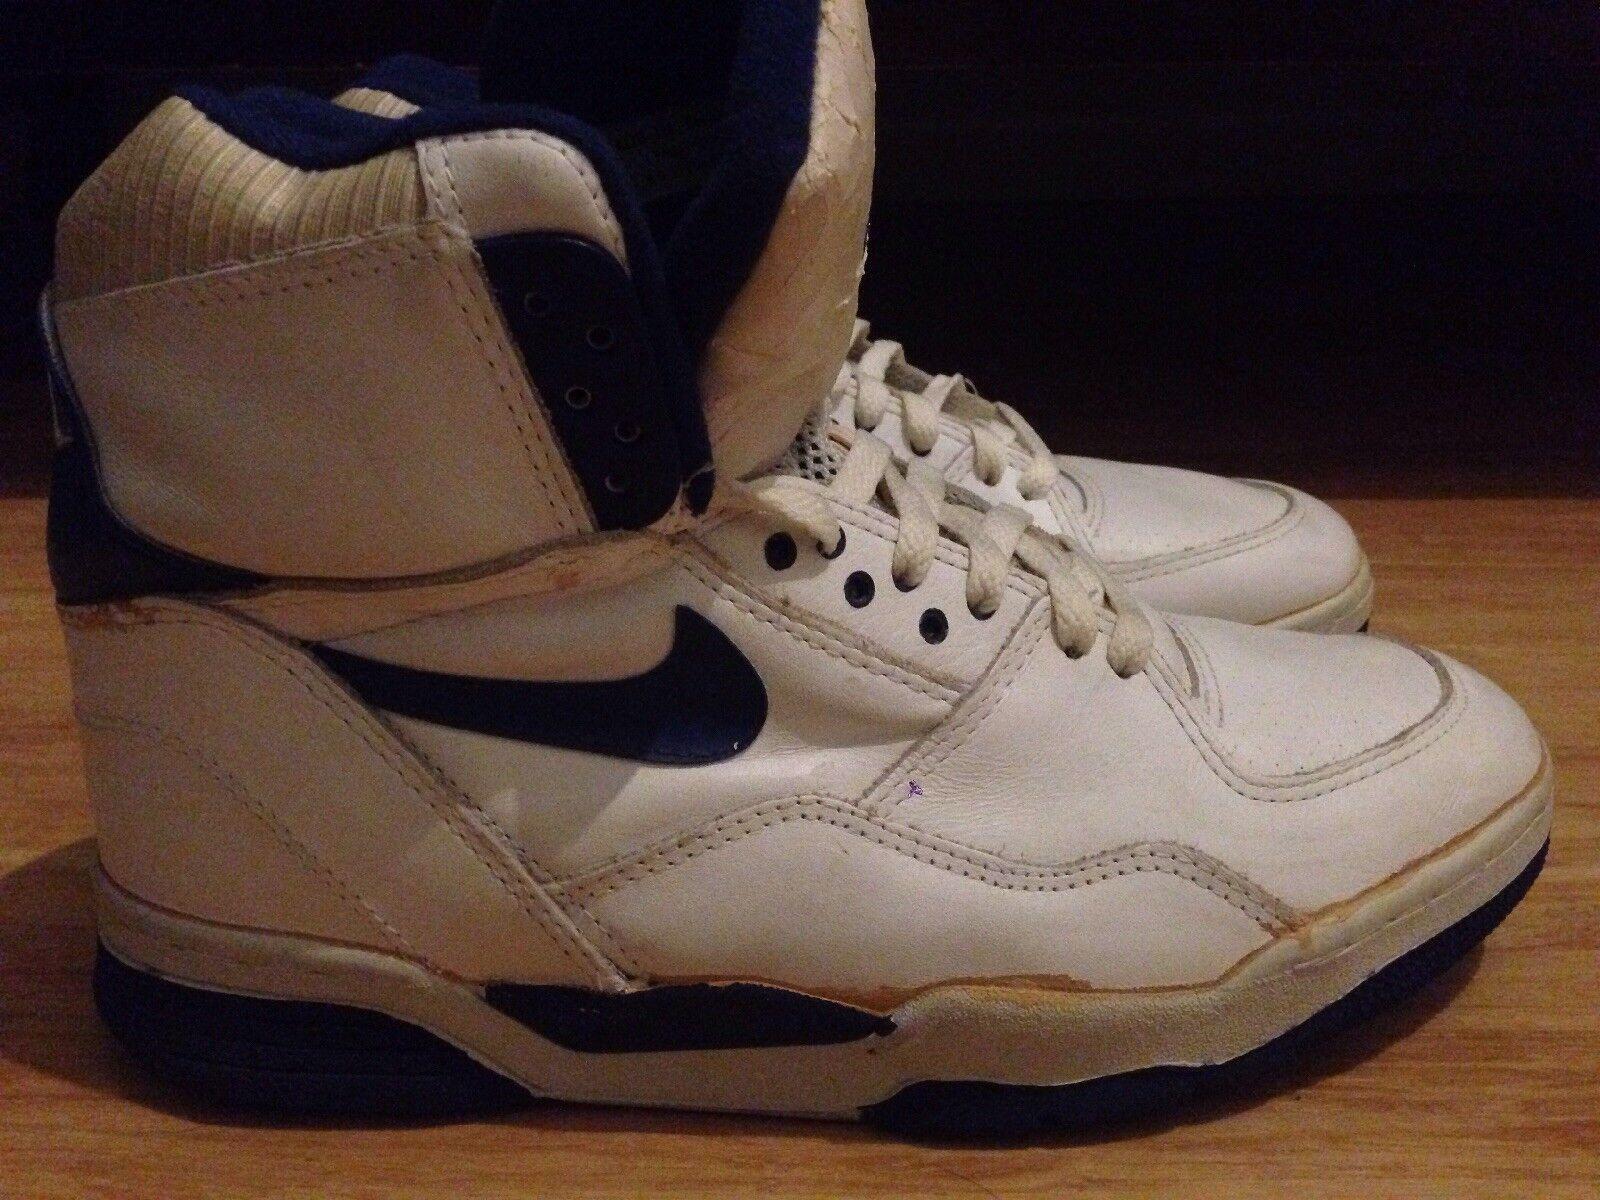 Nike air delta force st collezione bianco blu, scarpe da basket originale del 1989